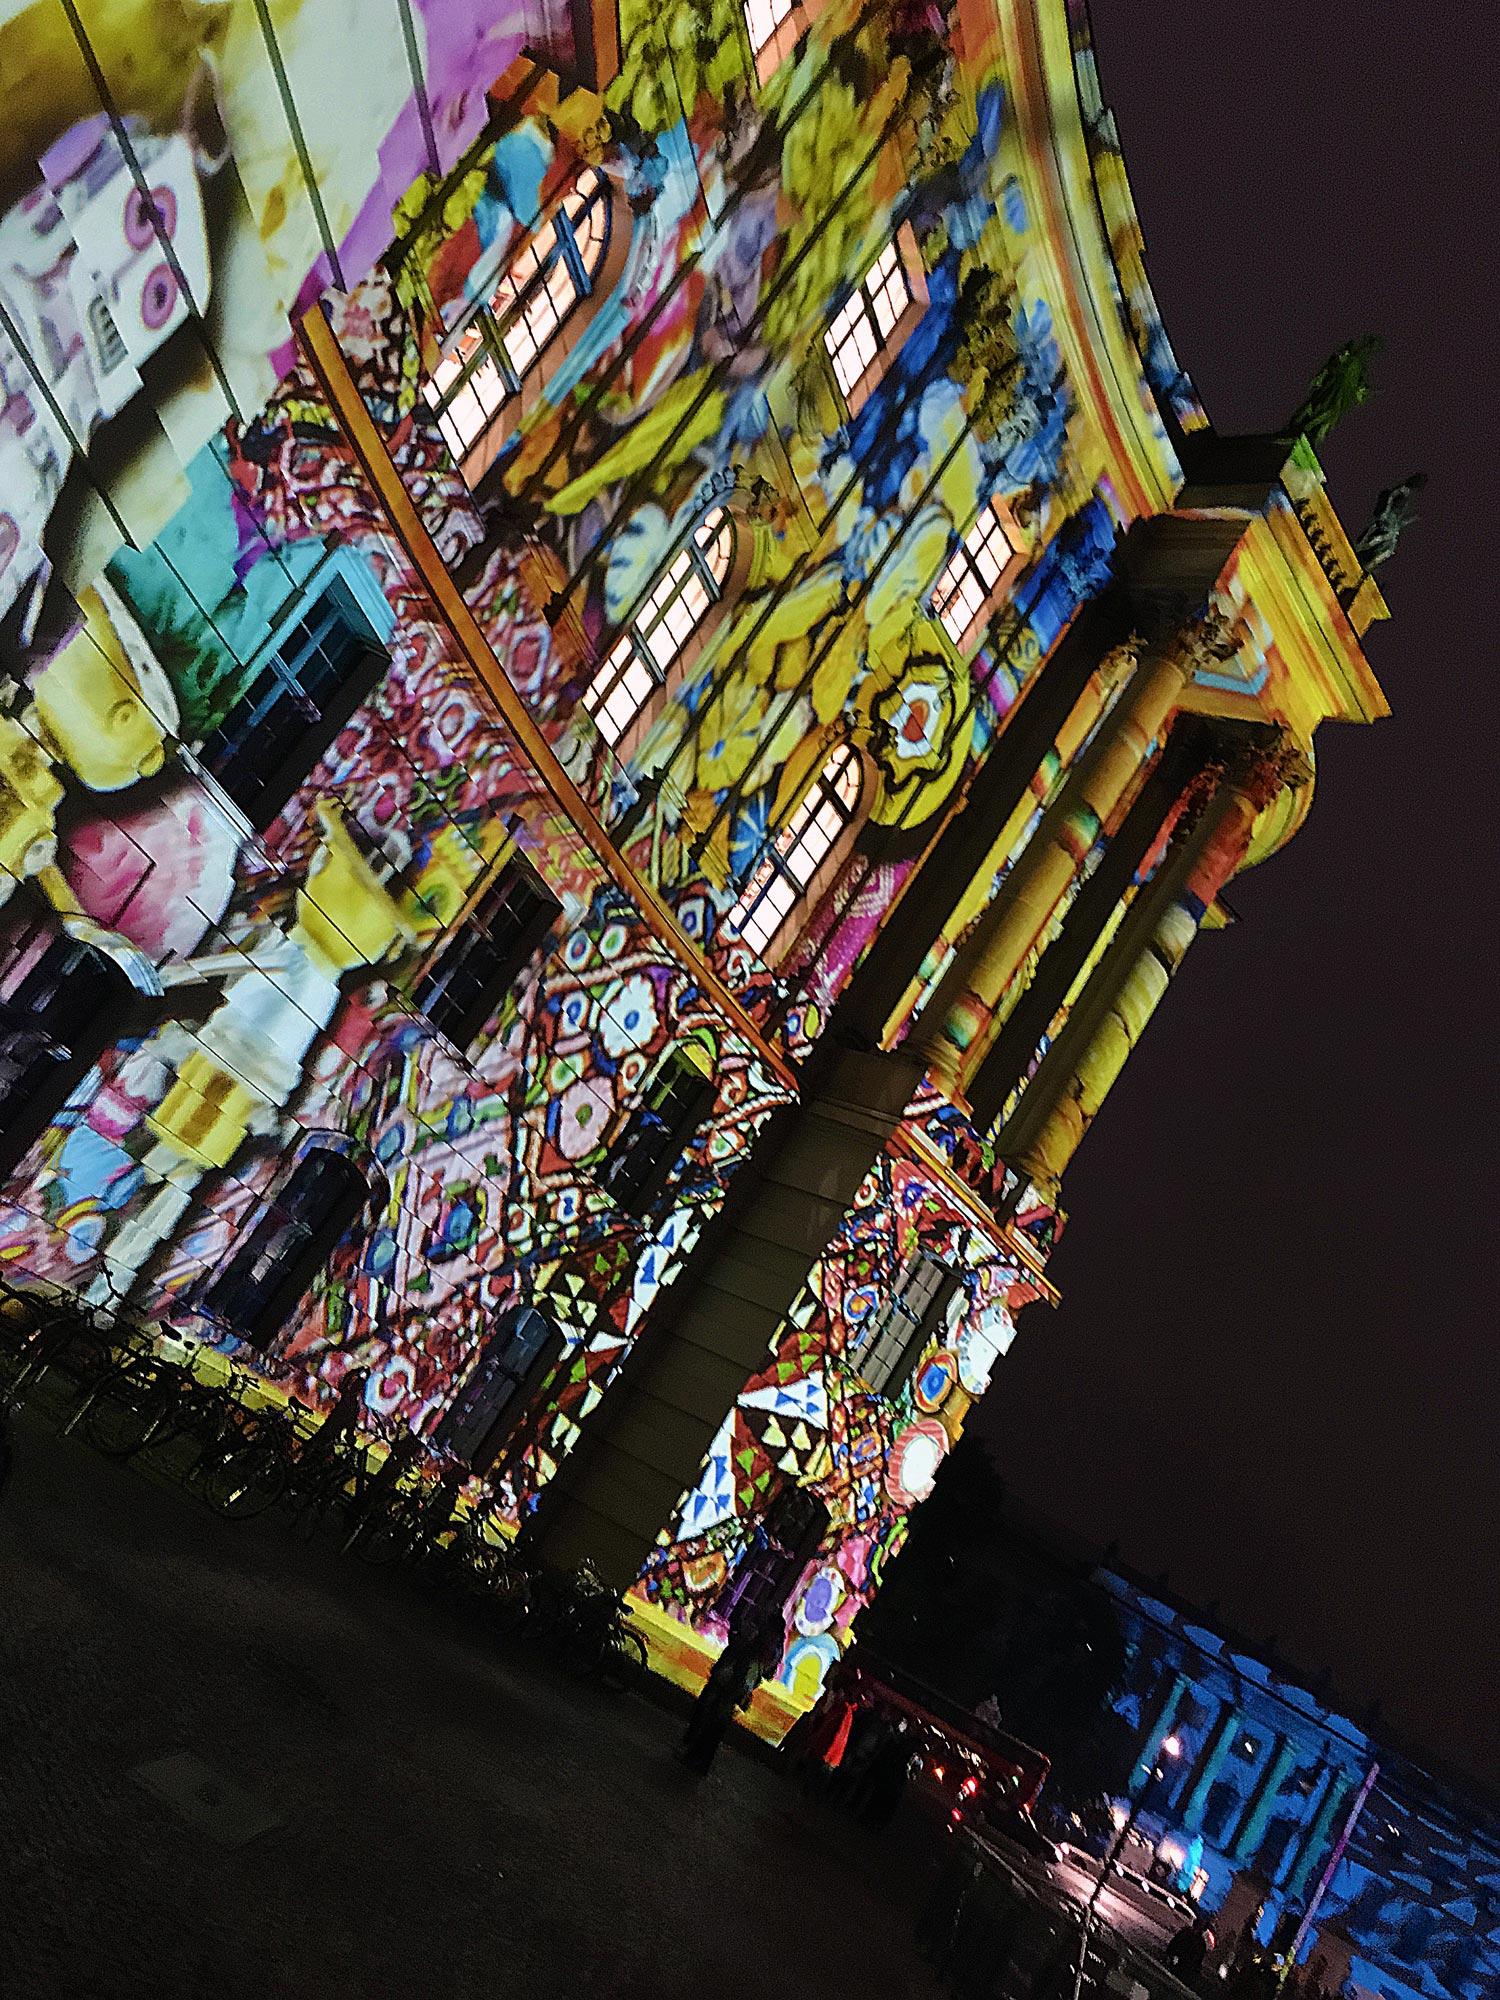 Festival of Lights 2016: Bebelplatz